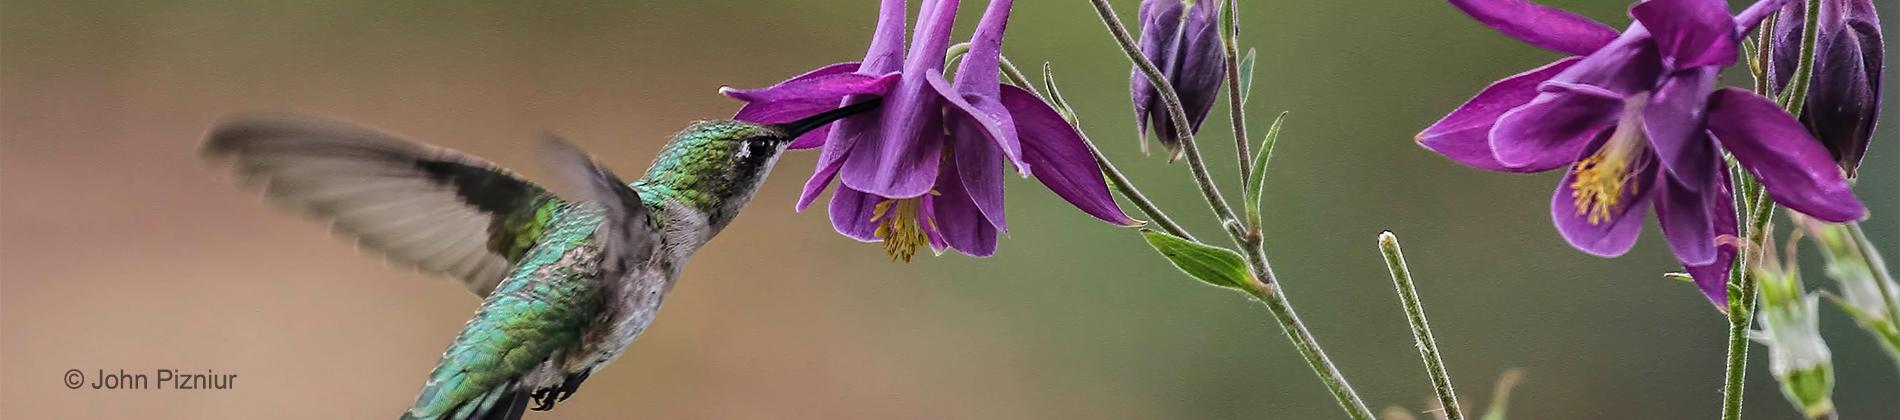 Hummingbird by John Pizniur